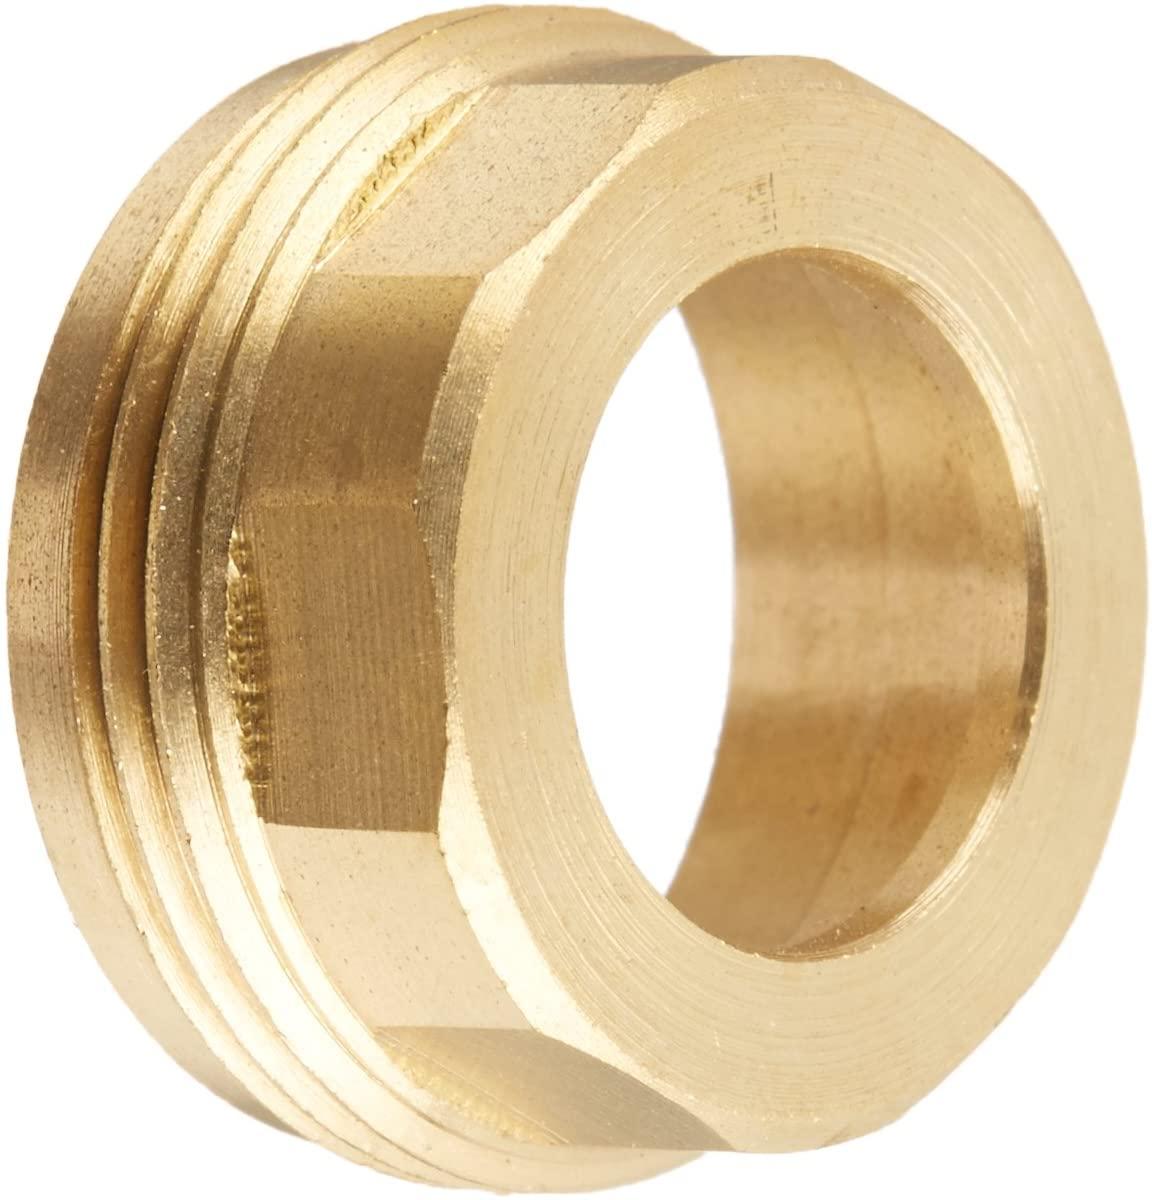 Pfister 9620420 Brass Retainer Nut